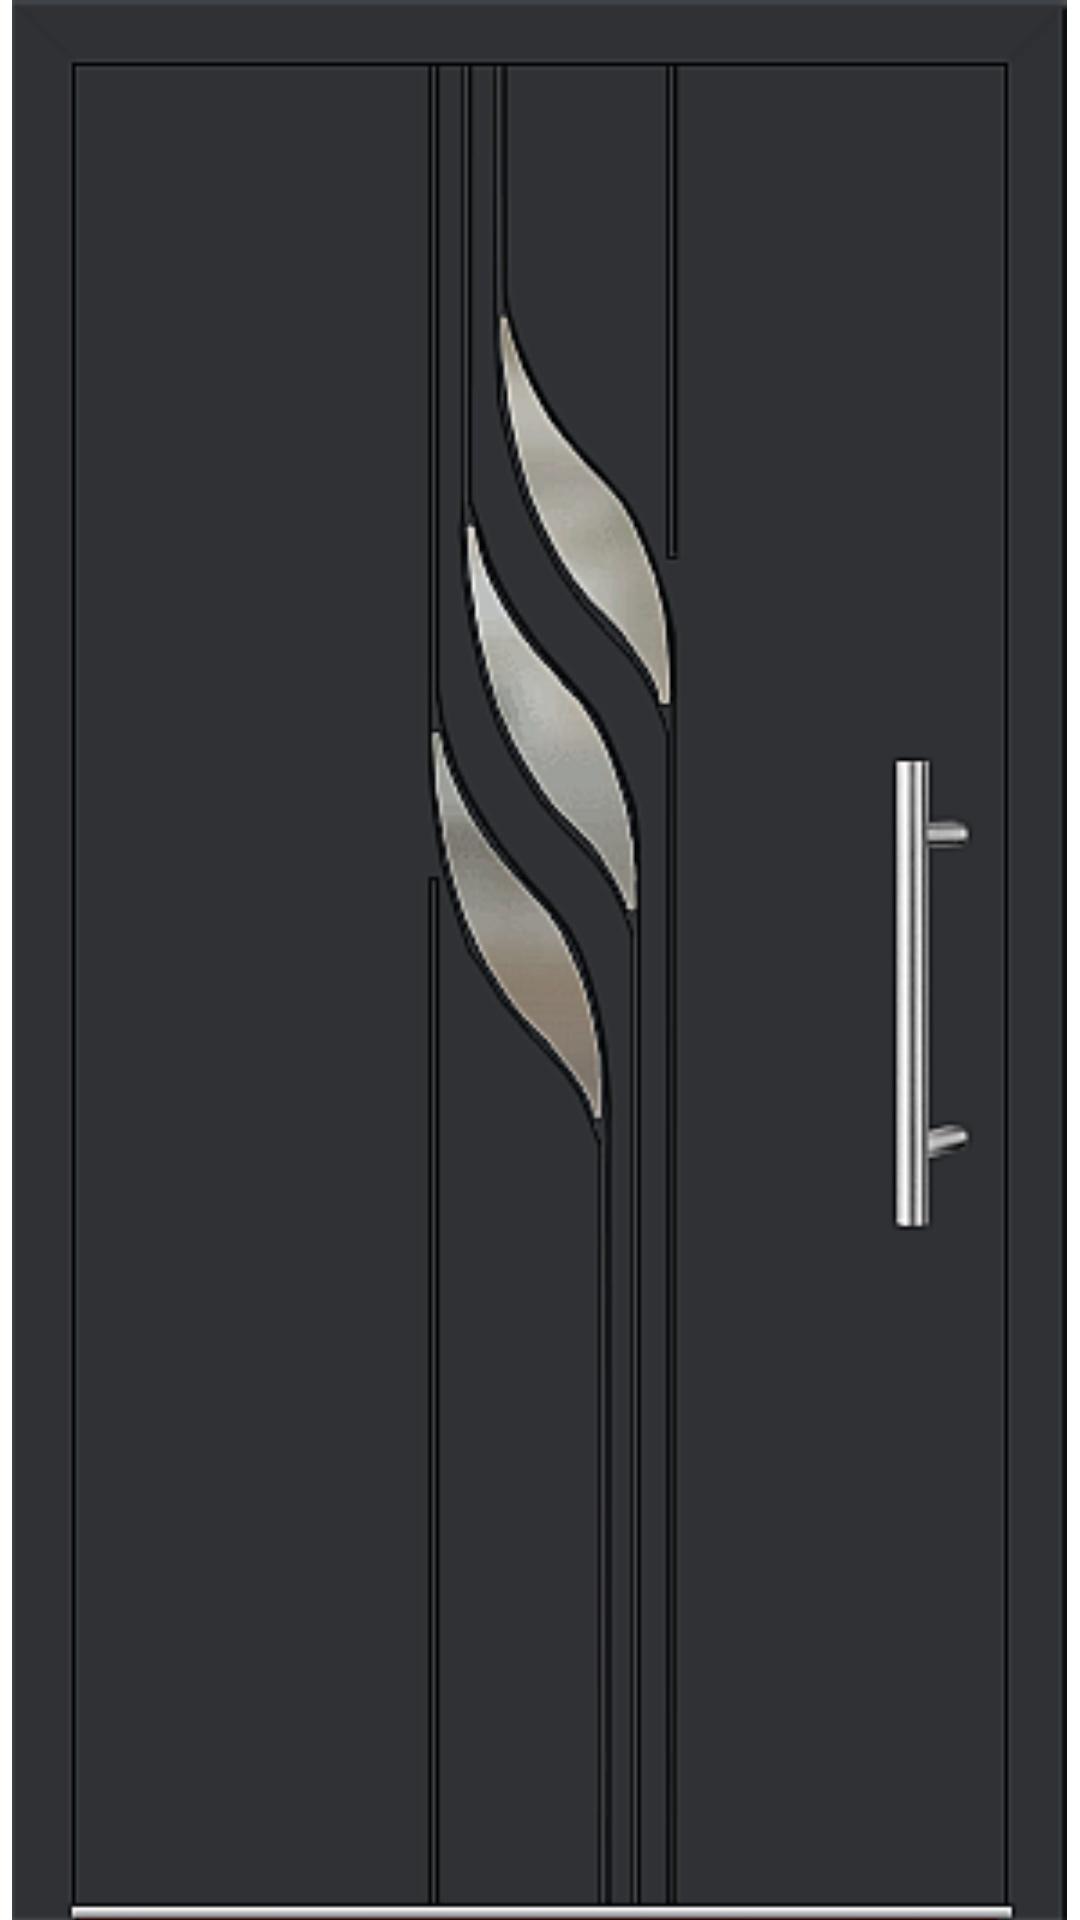 Aluminium Haustür Modell 6934-40 schwarz